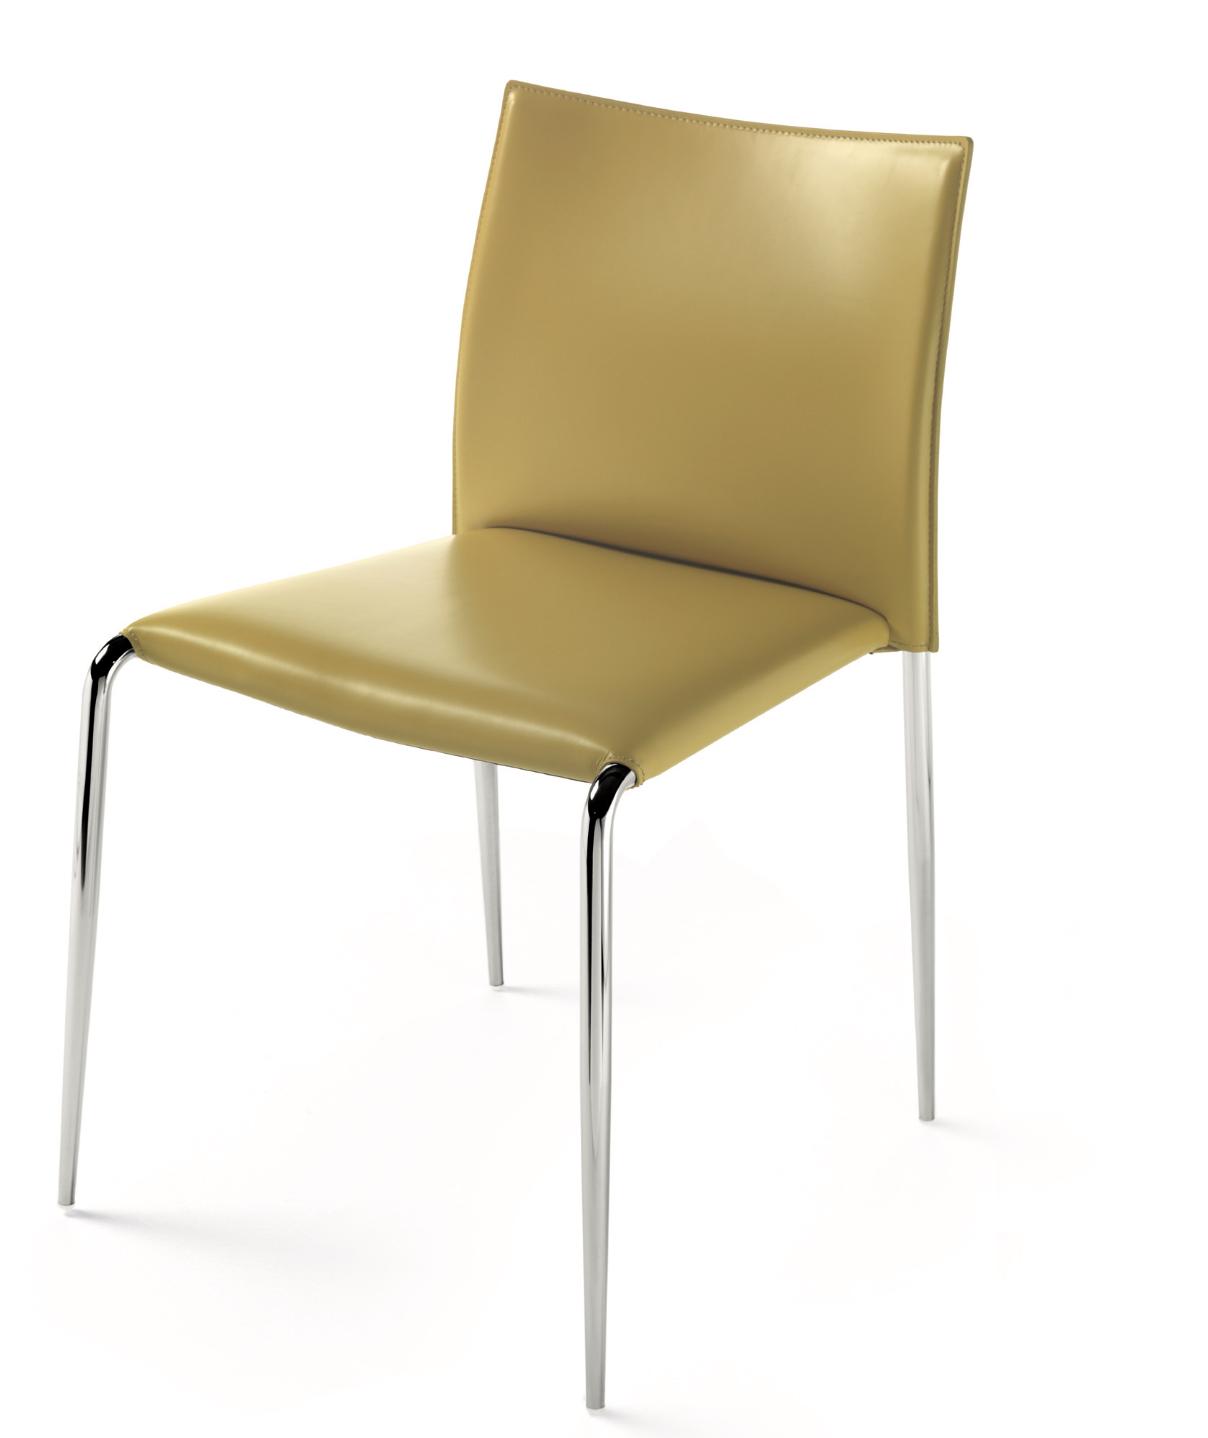 MDC 106 Modern Dining Chairs